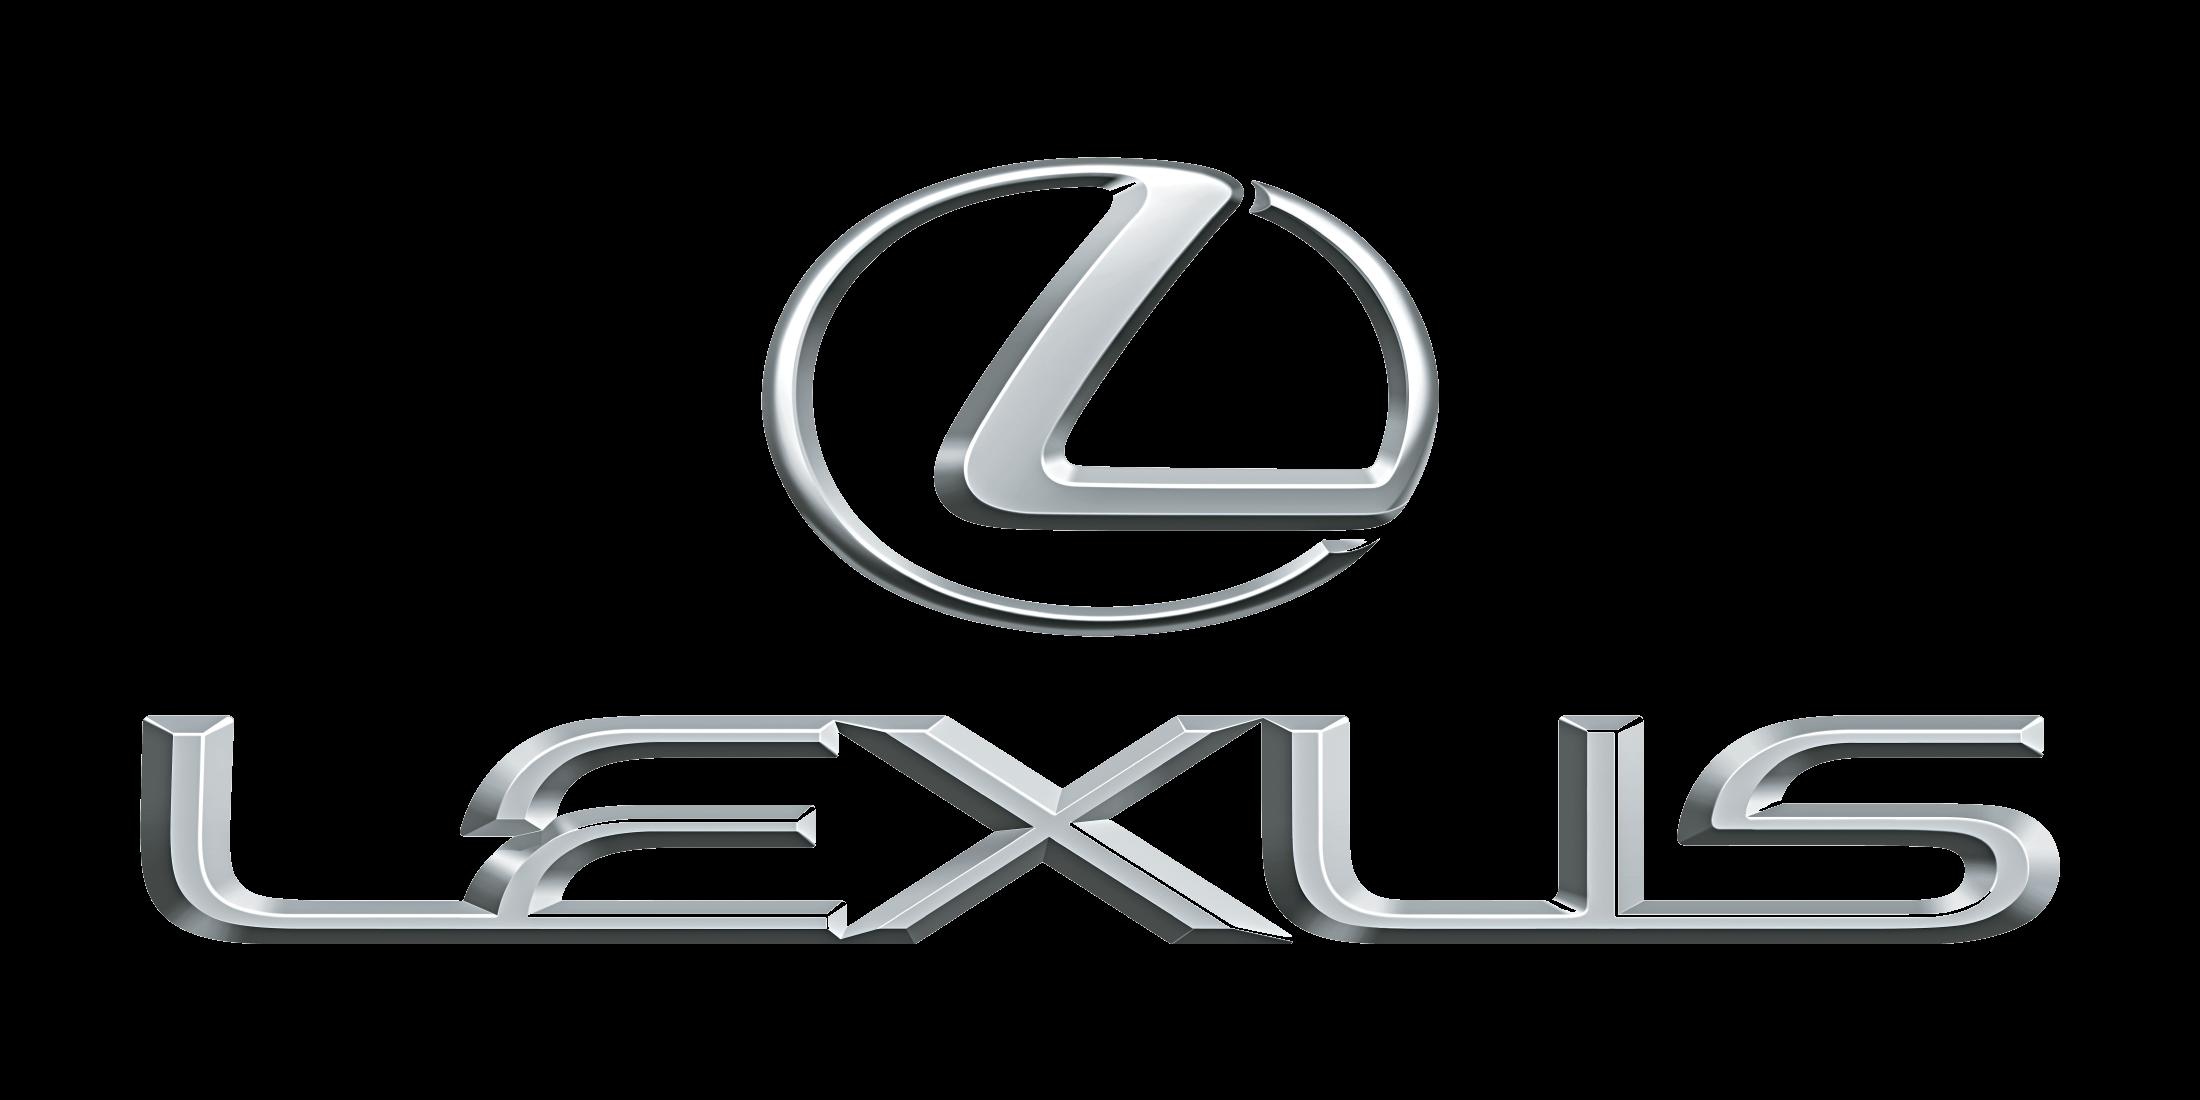 Lexus-Logo-Wallpaper-2016